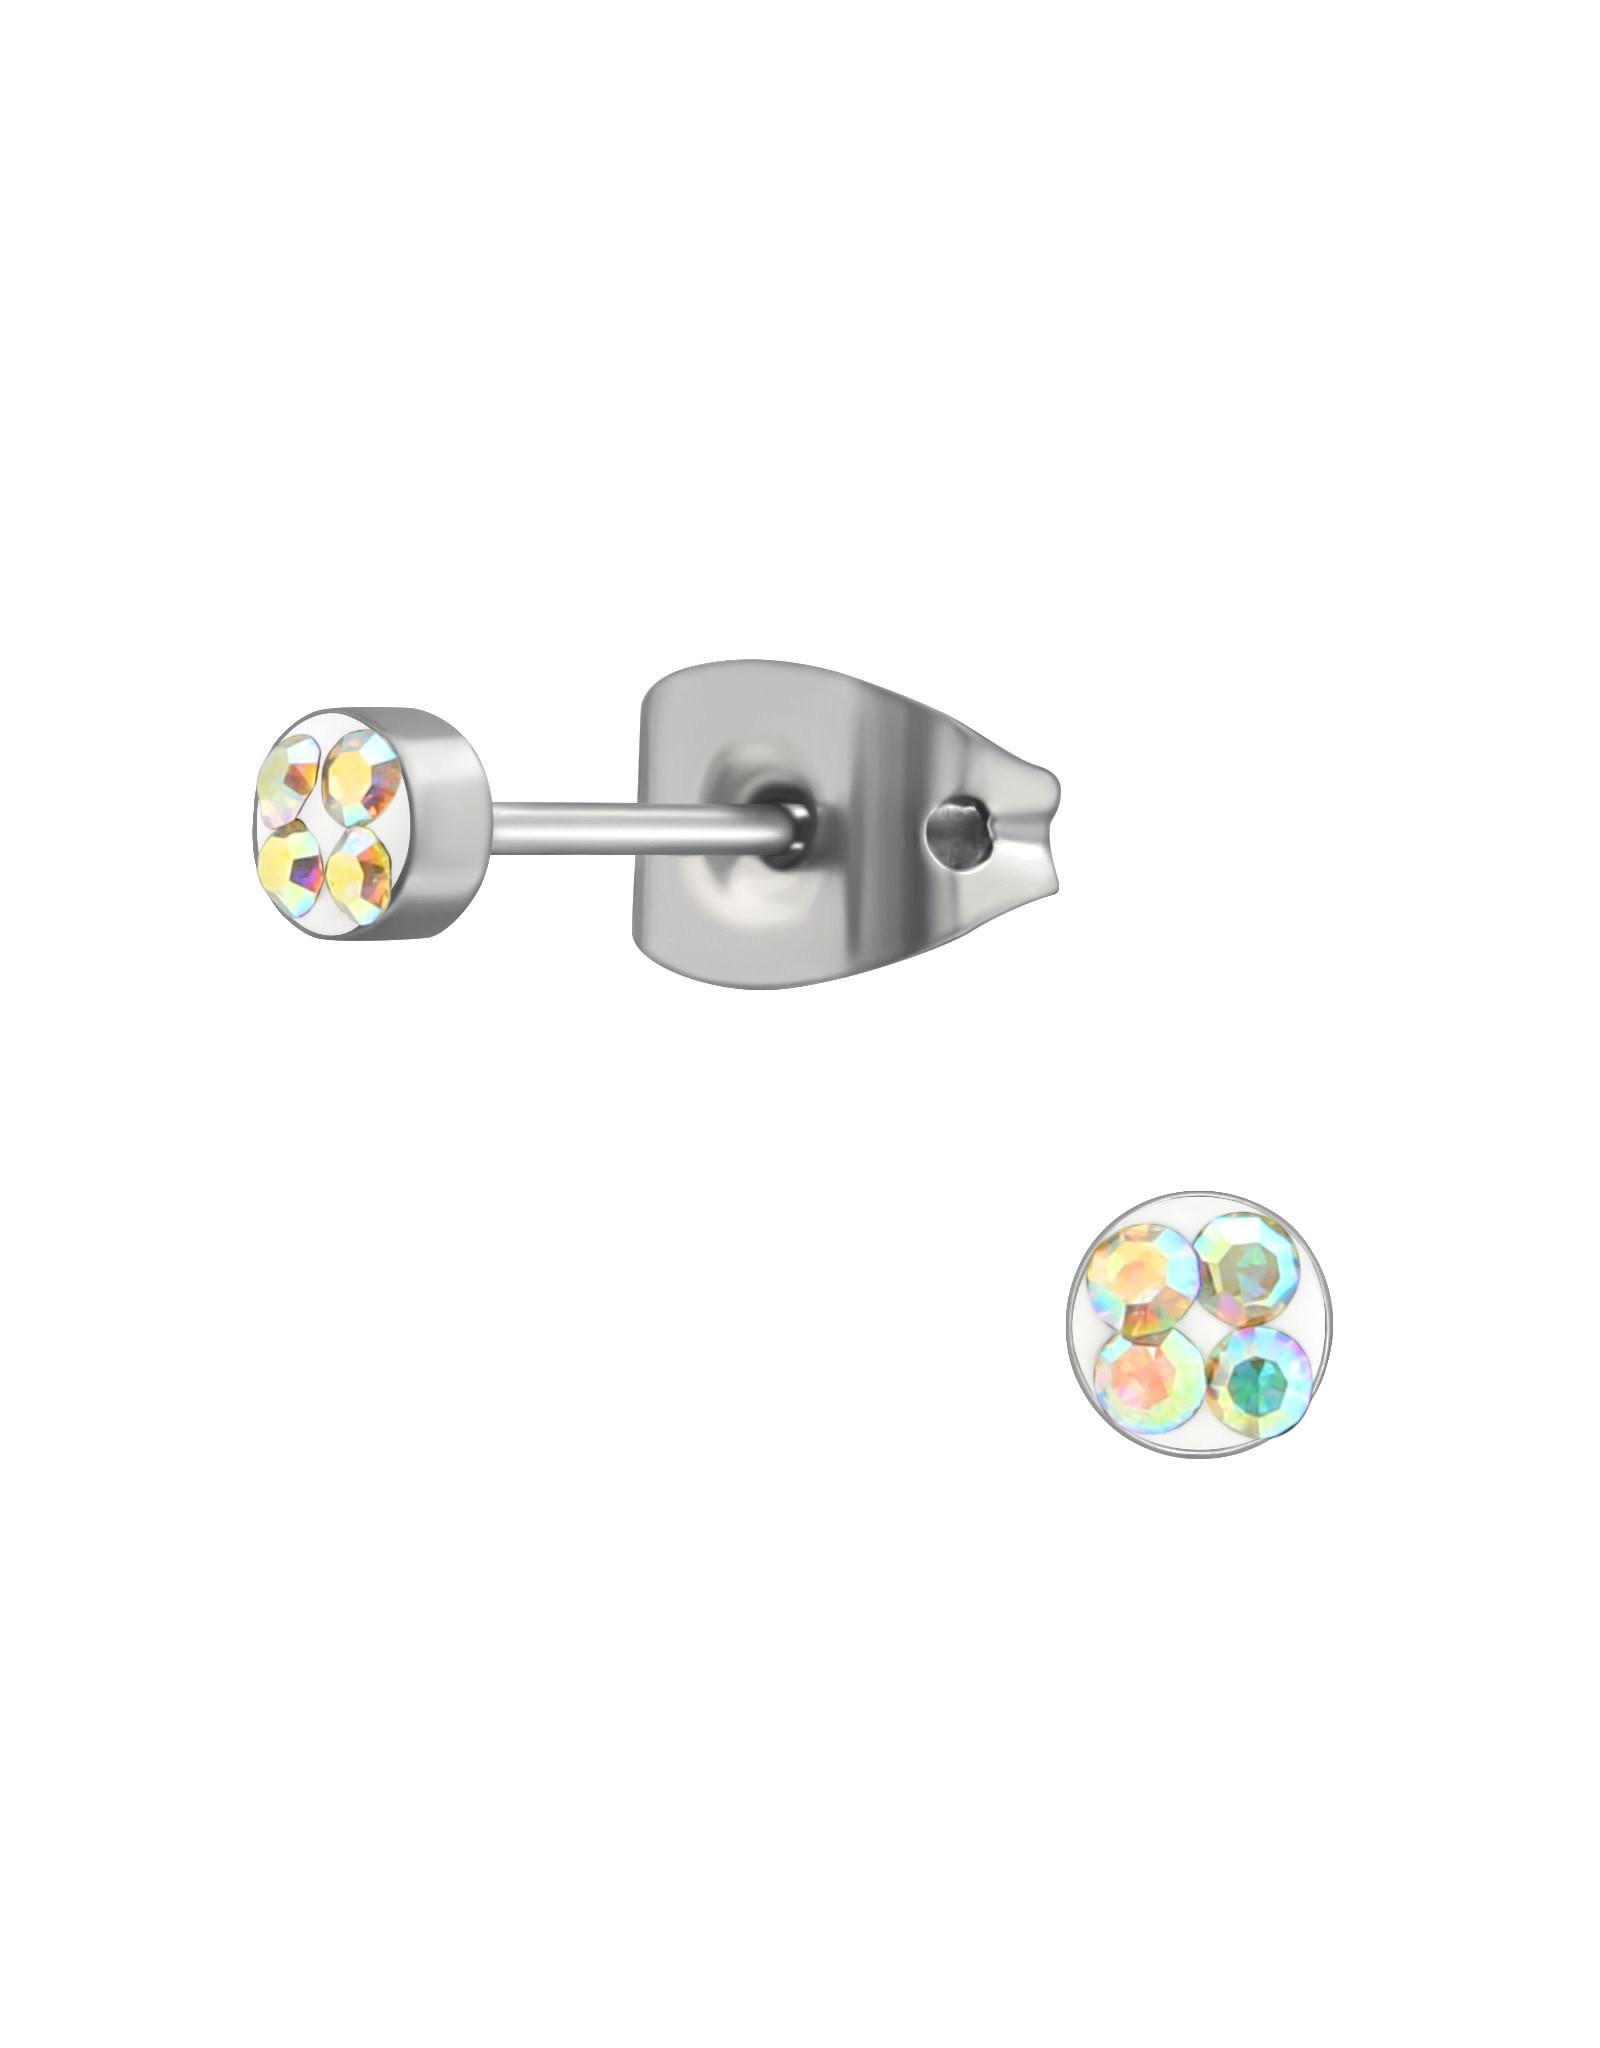 Stekertjes rvs kristal multicolor mini